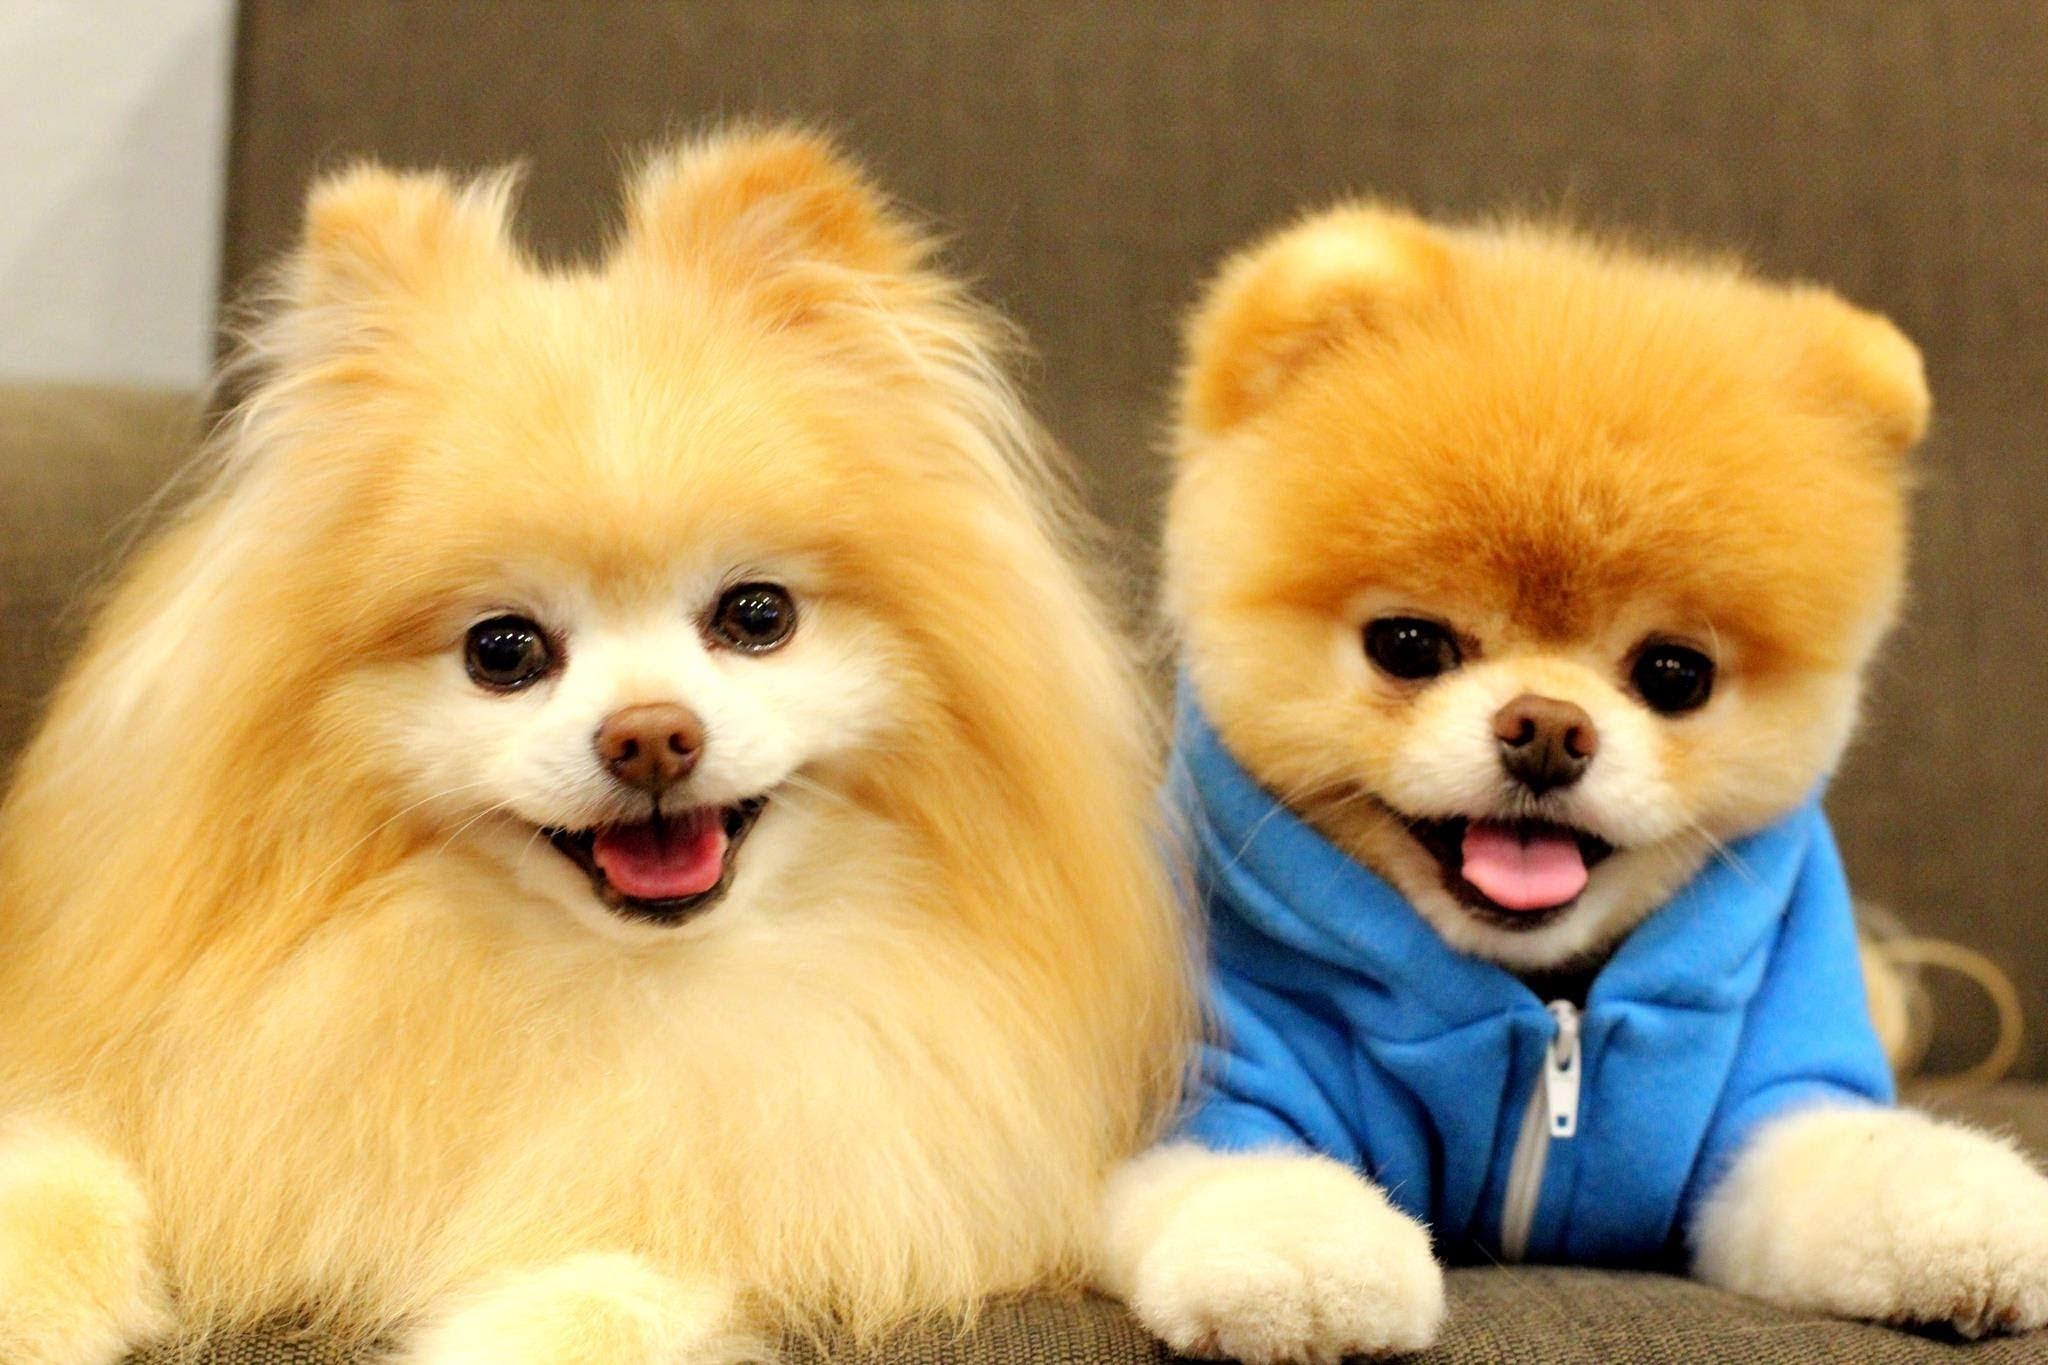 boo cute baby dog hd 2015 - 15 minutes of boo - youtube